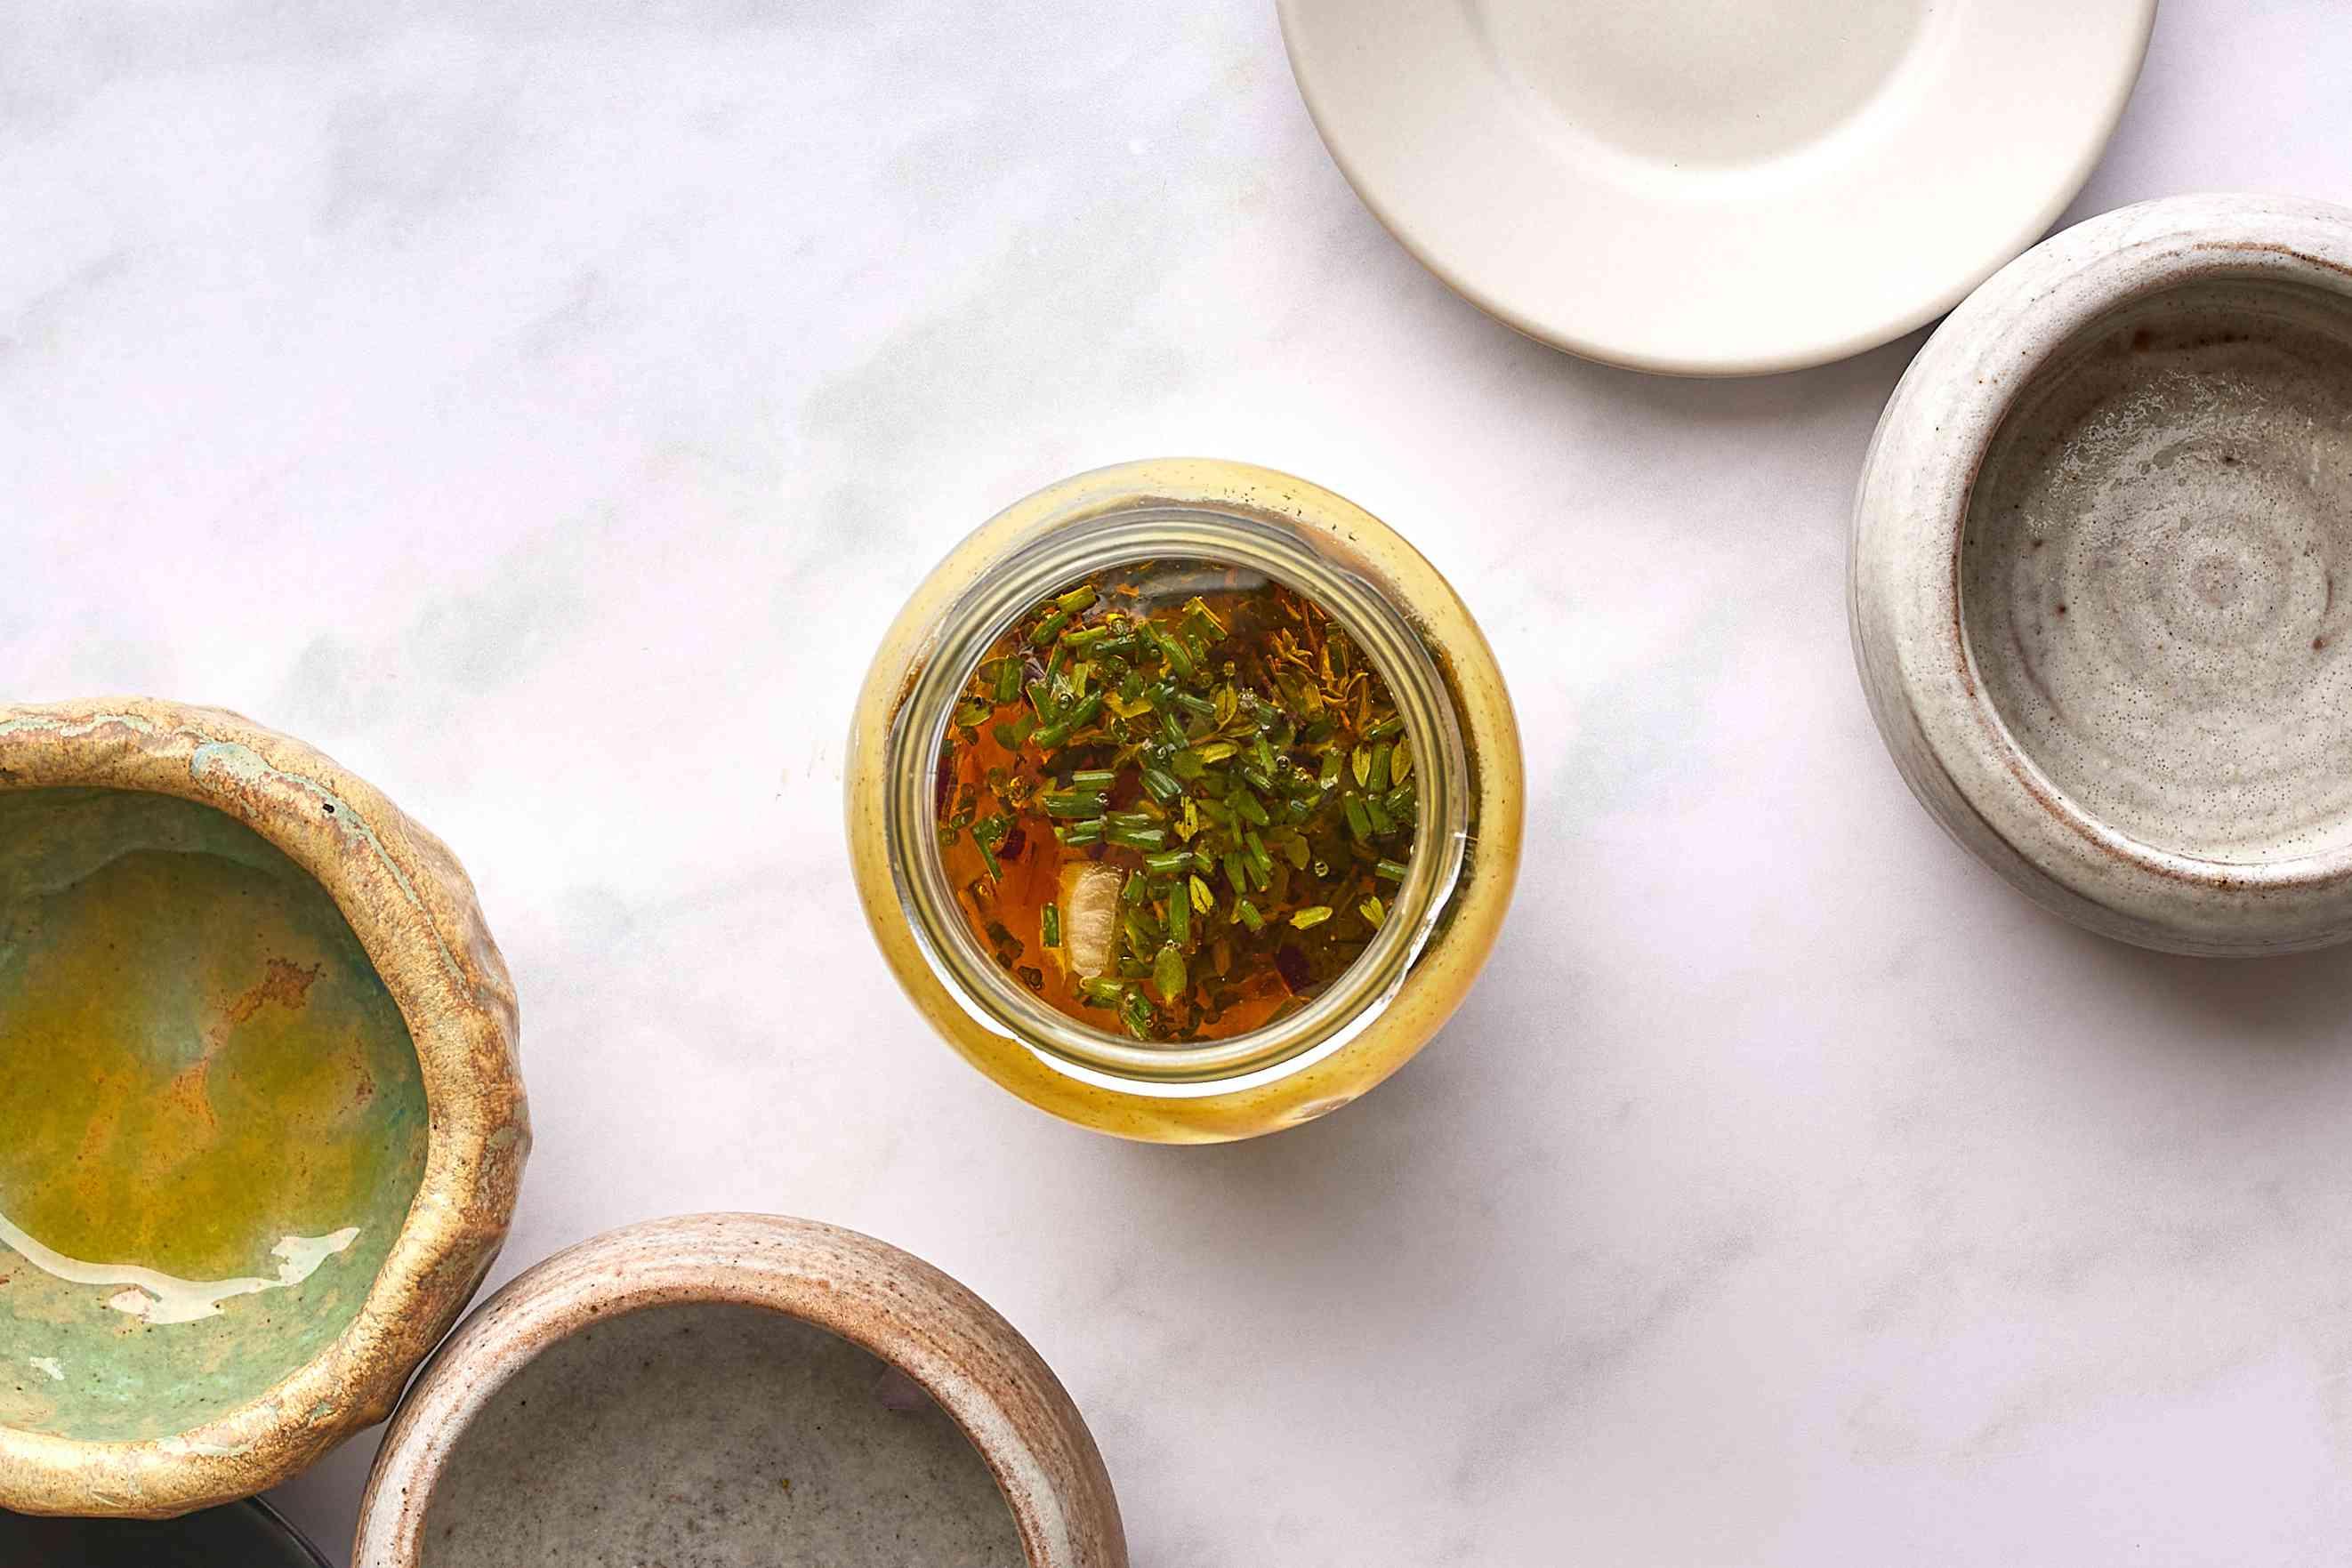 all of the Easy Mustard Jar Salad Dressing ingredients in a jar